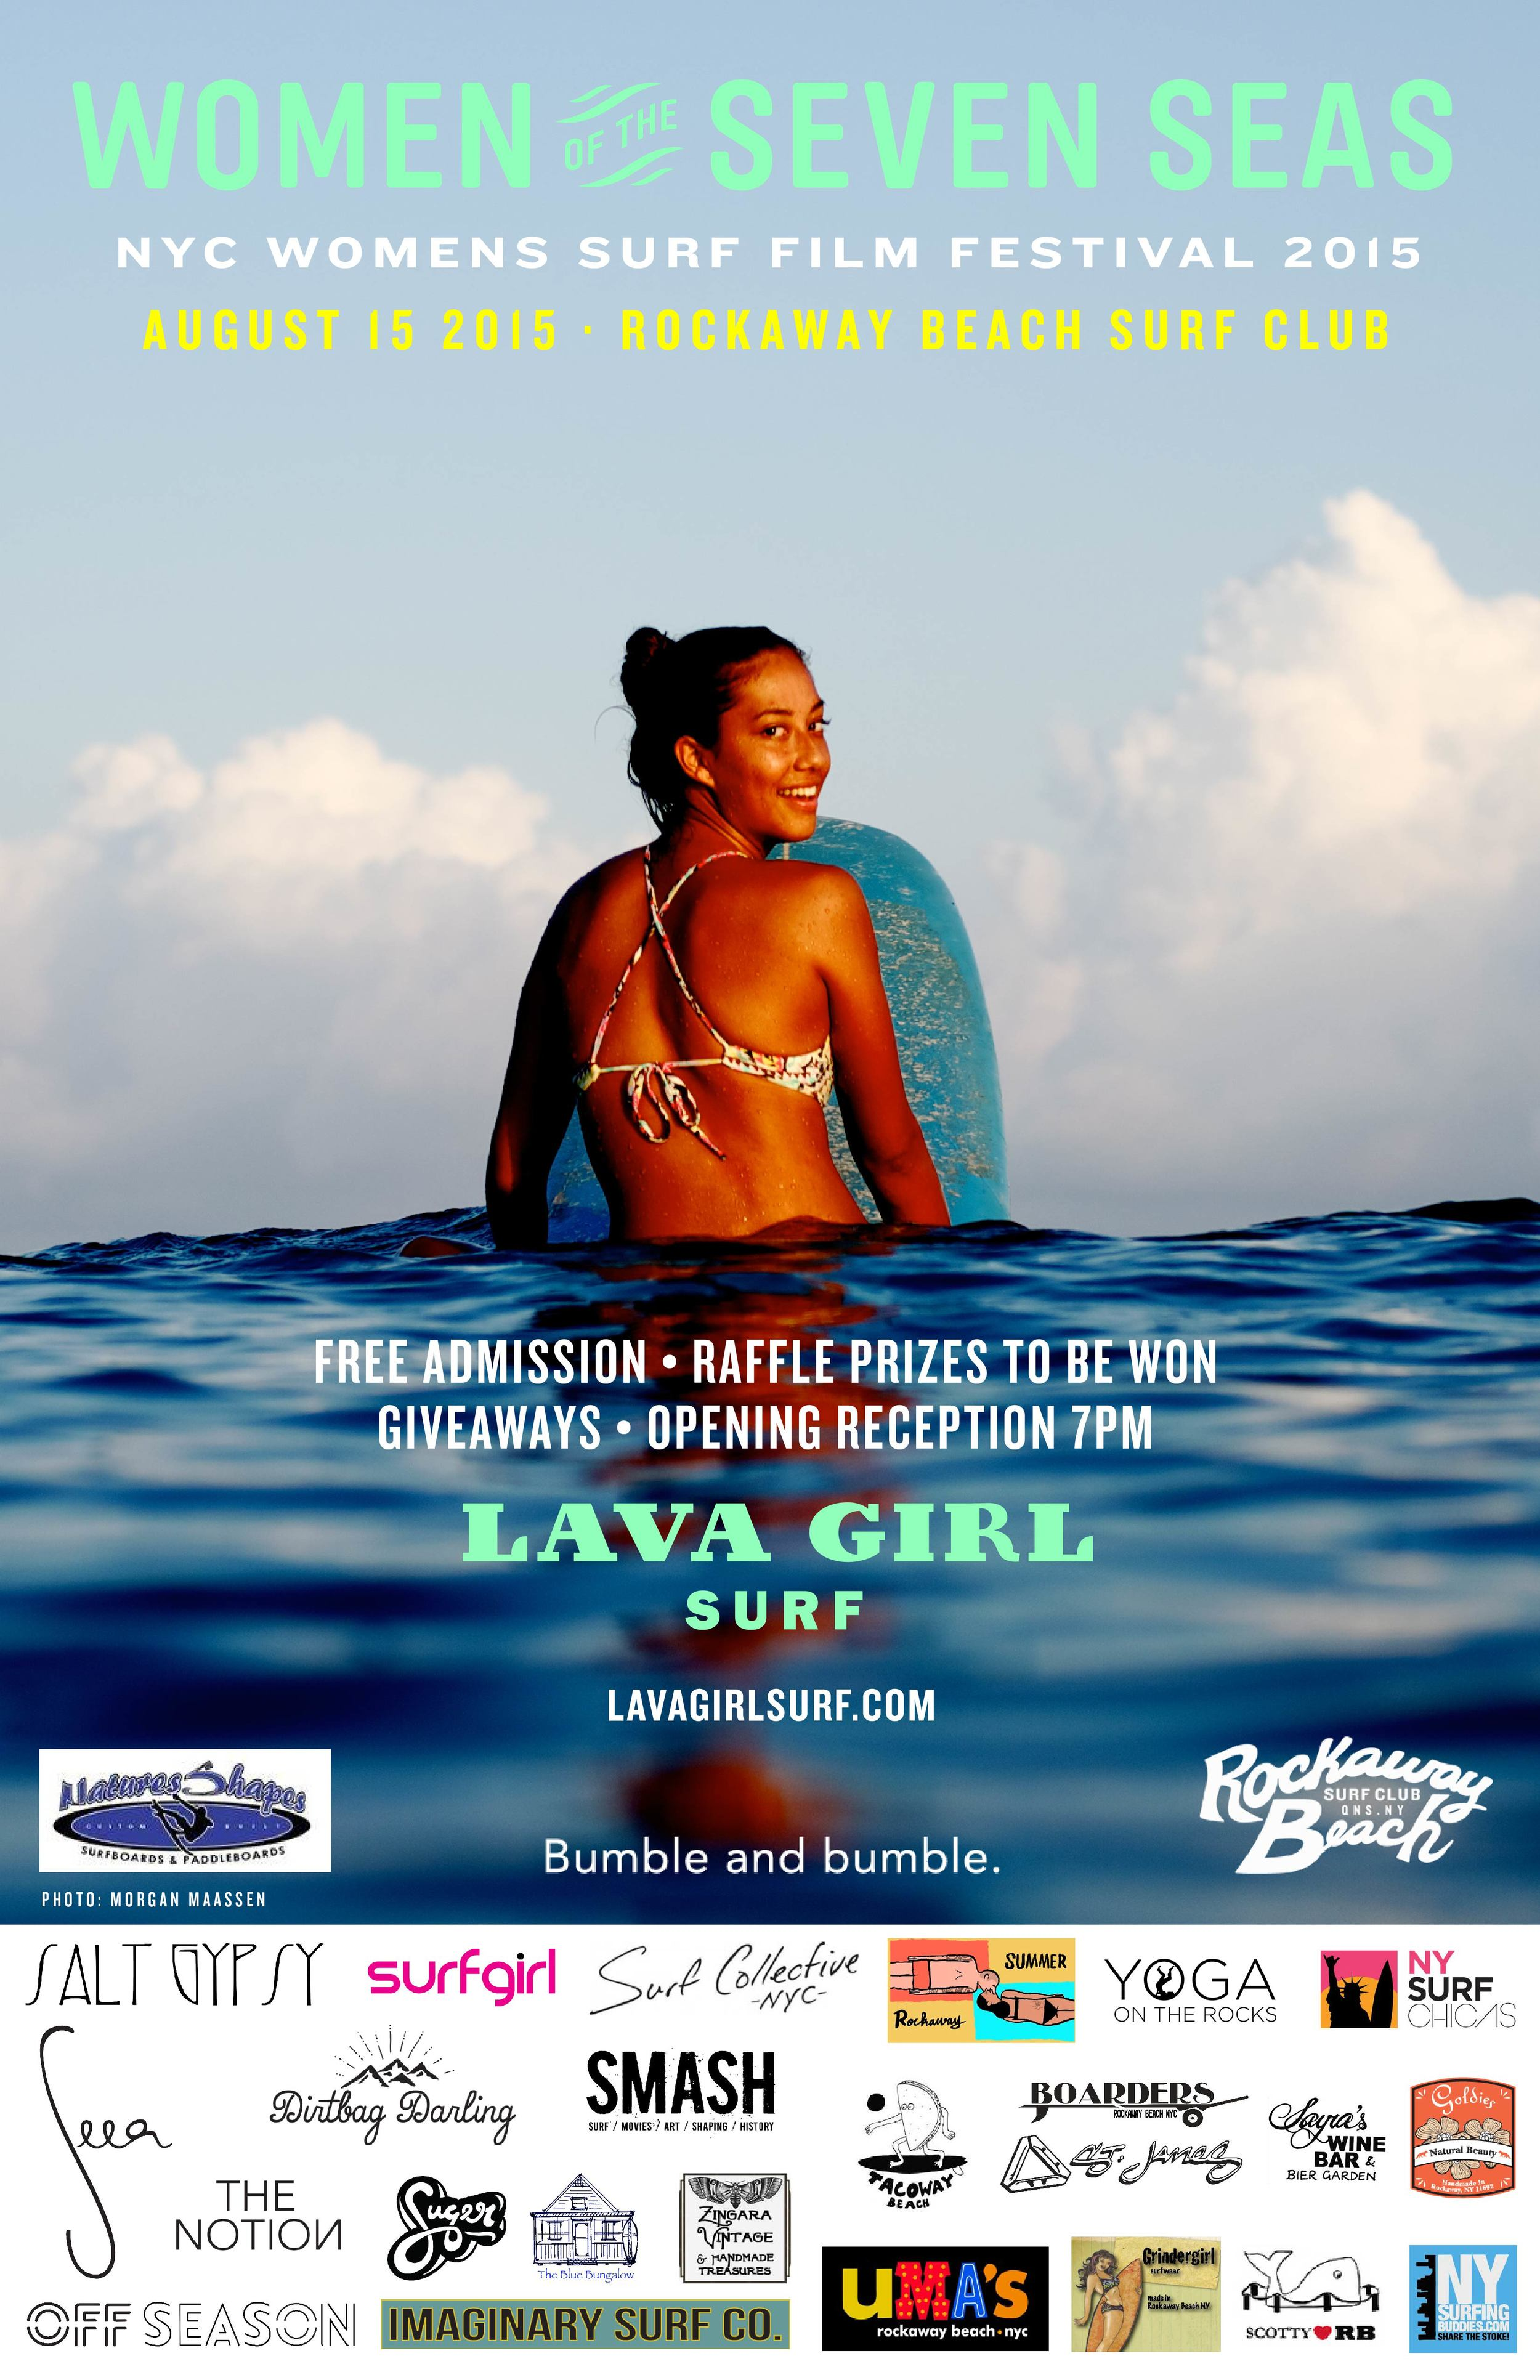 lava girl surf nyc womens surf film festival